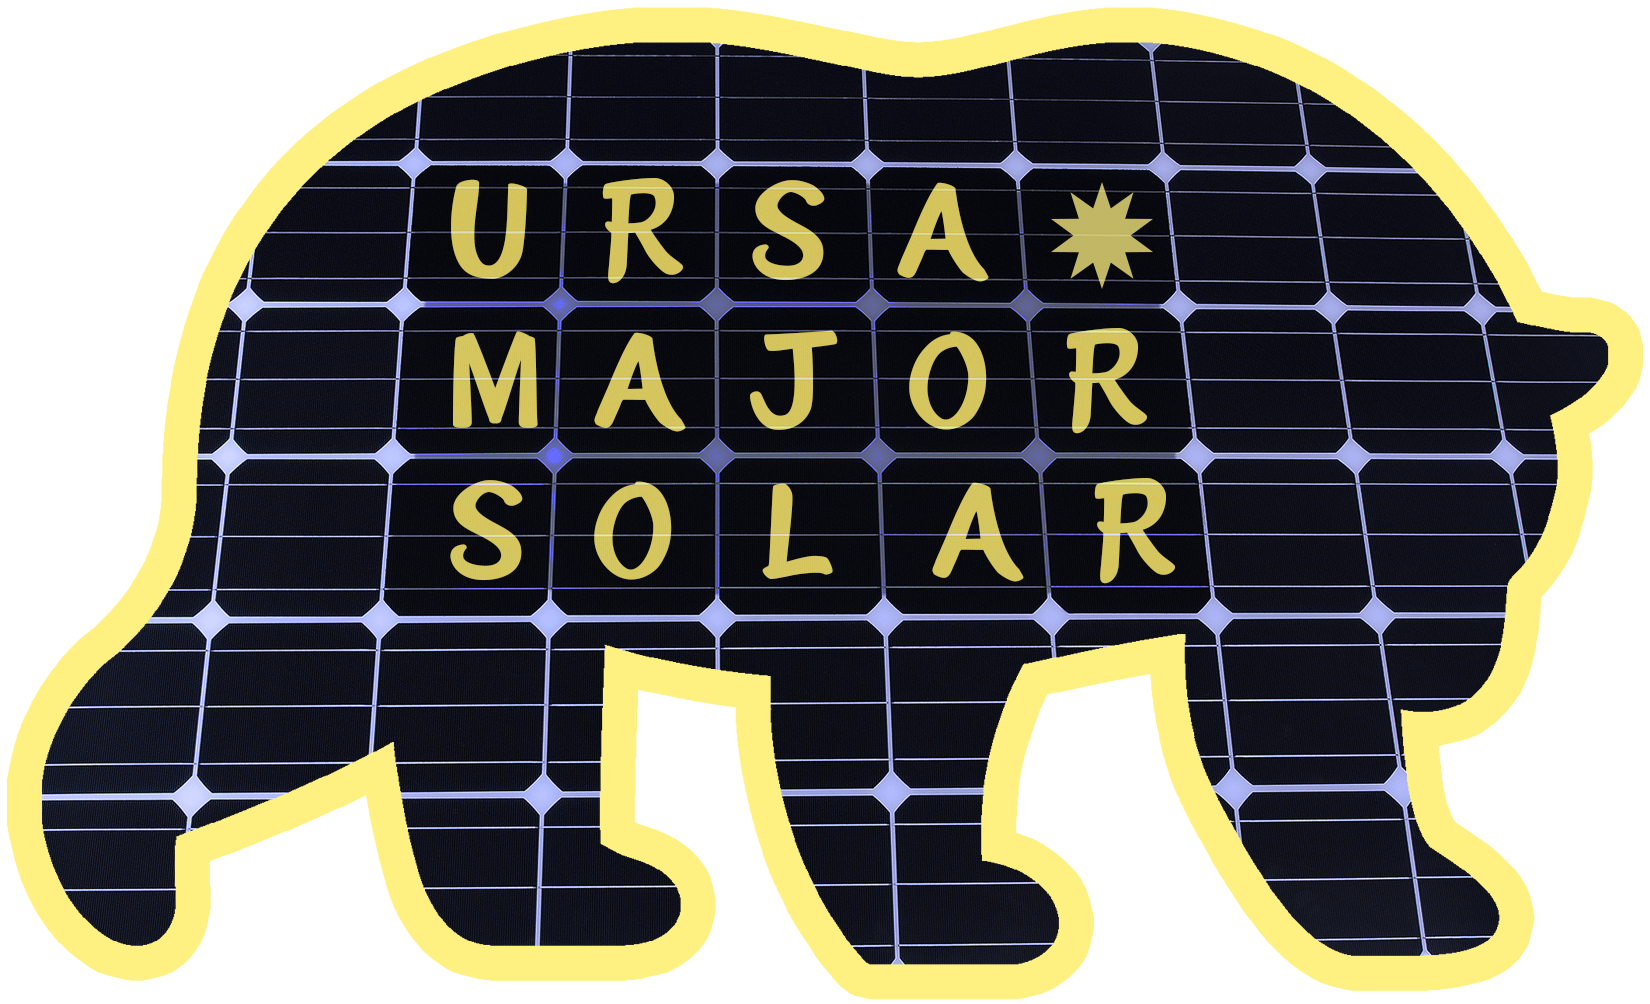 Logo von Ursa Major Solar, Inc.